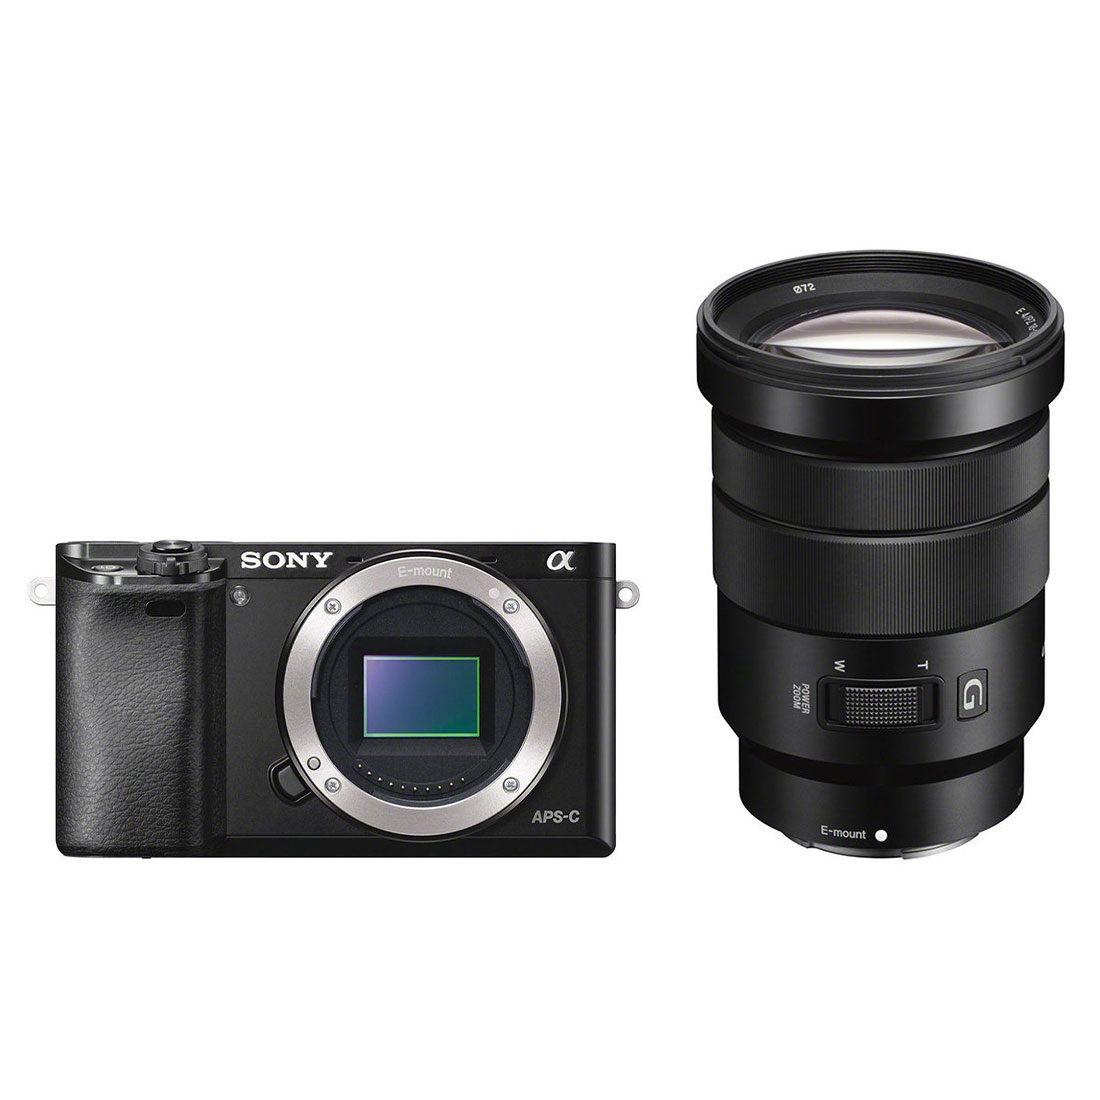 Sony Alpha A6000 ICL systeemcamera Zwart + 18-105mm f/4.0 <br/>€ 879.00 <br/> <a href='https://www.cameranu.nl/fotografie/?tt=12190_474631_241358_&r=https%3A%2F%2Fwww.cameranu.nl%2Fnl%2Fp3194522%2Fsony-alpha-a6000-icl-systeemcamera-zwart-18-105mm-f-4-0%3Fchannable%3D002a596964003331393435323275%26utm_campaign%3D%26utm_content%3DSony%2Bsysteemcamera%26utm_source%3DTradetracker%26utm_medium%3Dcpc%26utm_term%3DDigitale%2Bcamera%26apos%3Bs' target='_blank'>naar de winkel</a>